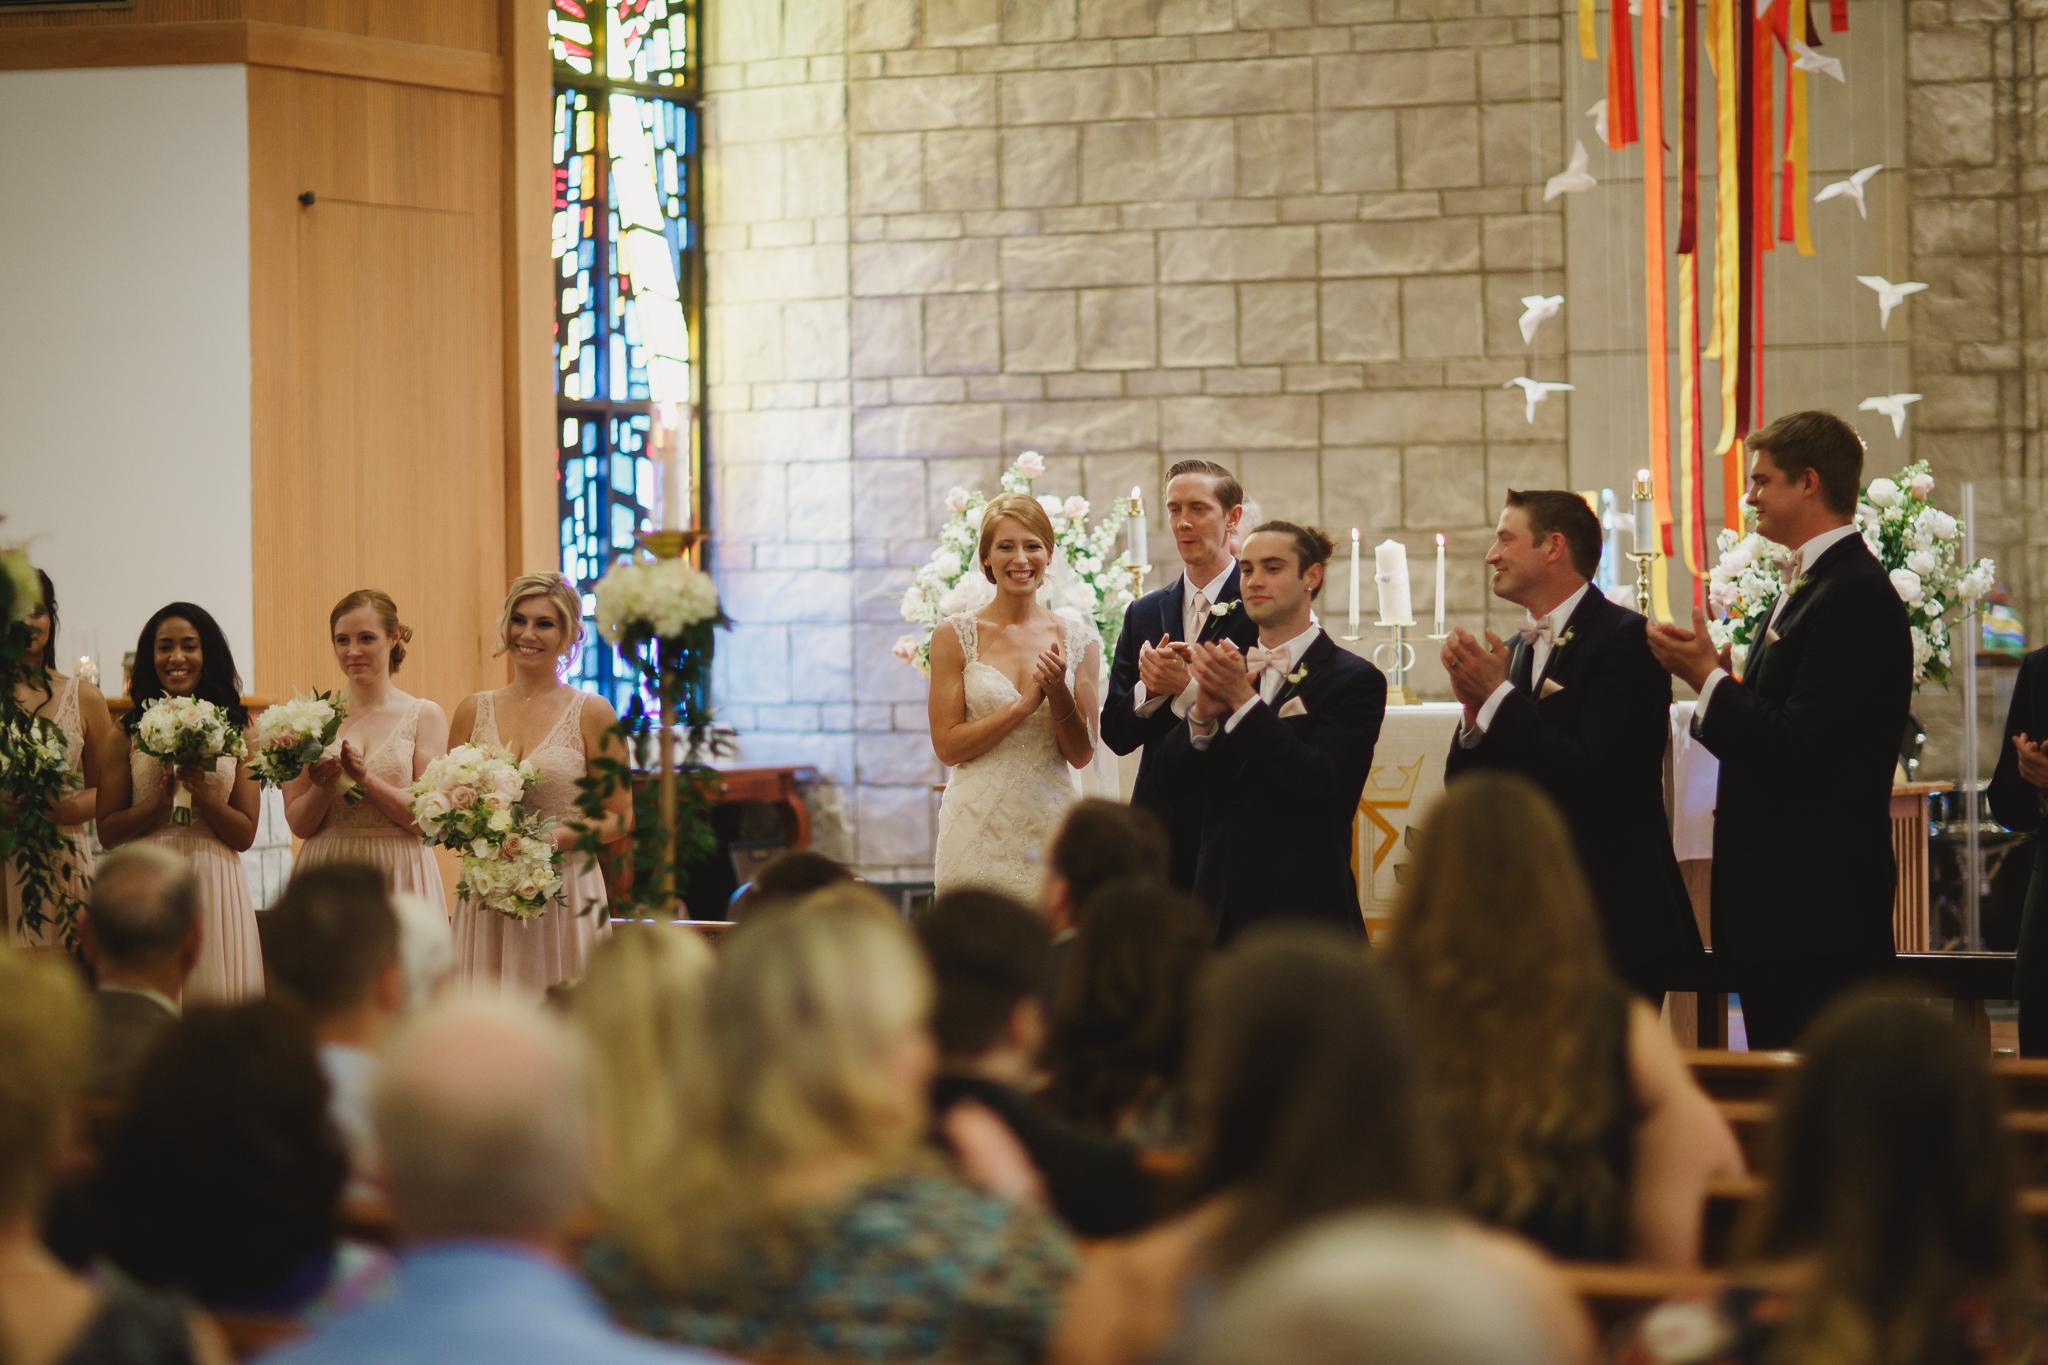 Michael and Kelly - the ashton depot - wedding DFW - wedding photographer- elizalde photography (42 of 150).jpg